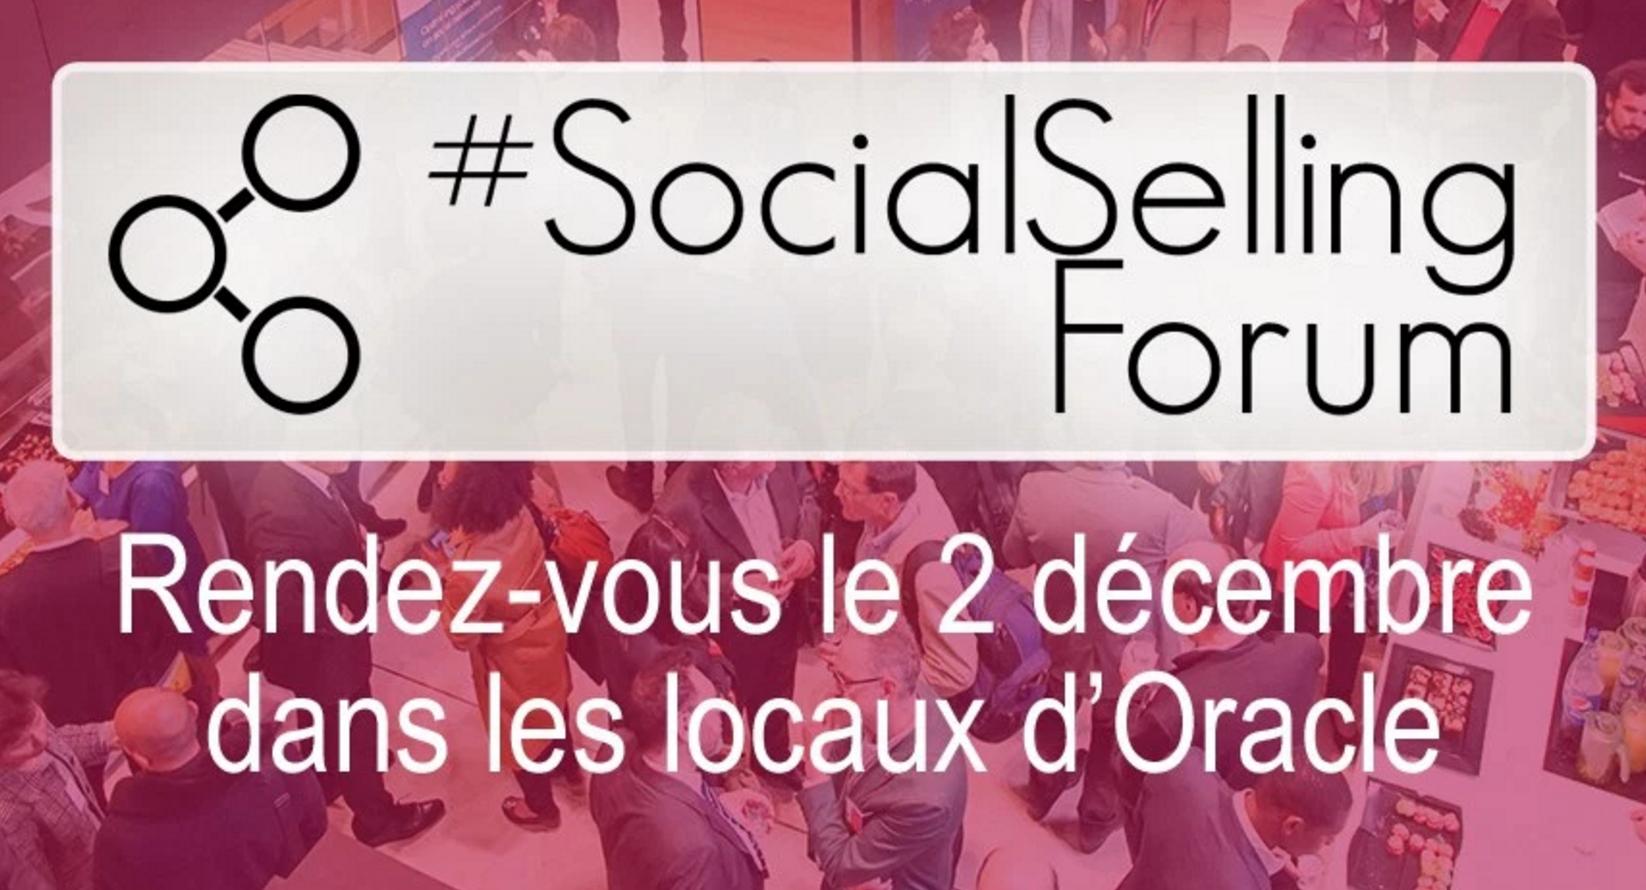 social-selling-forum